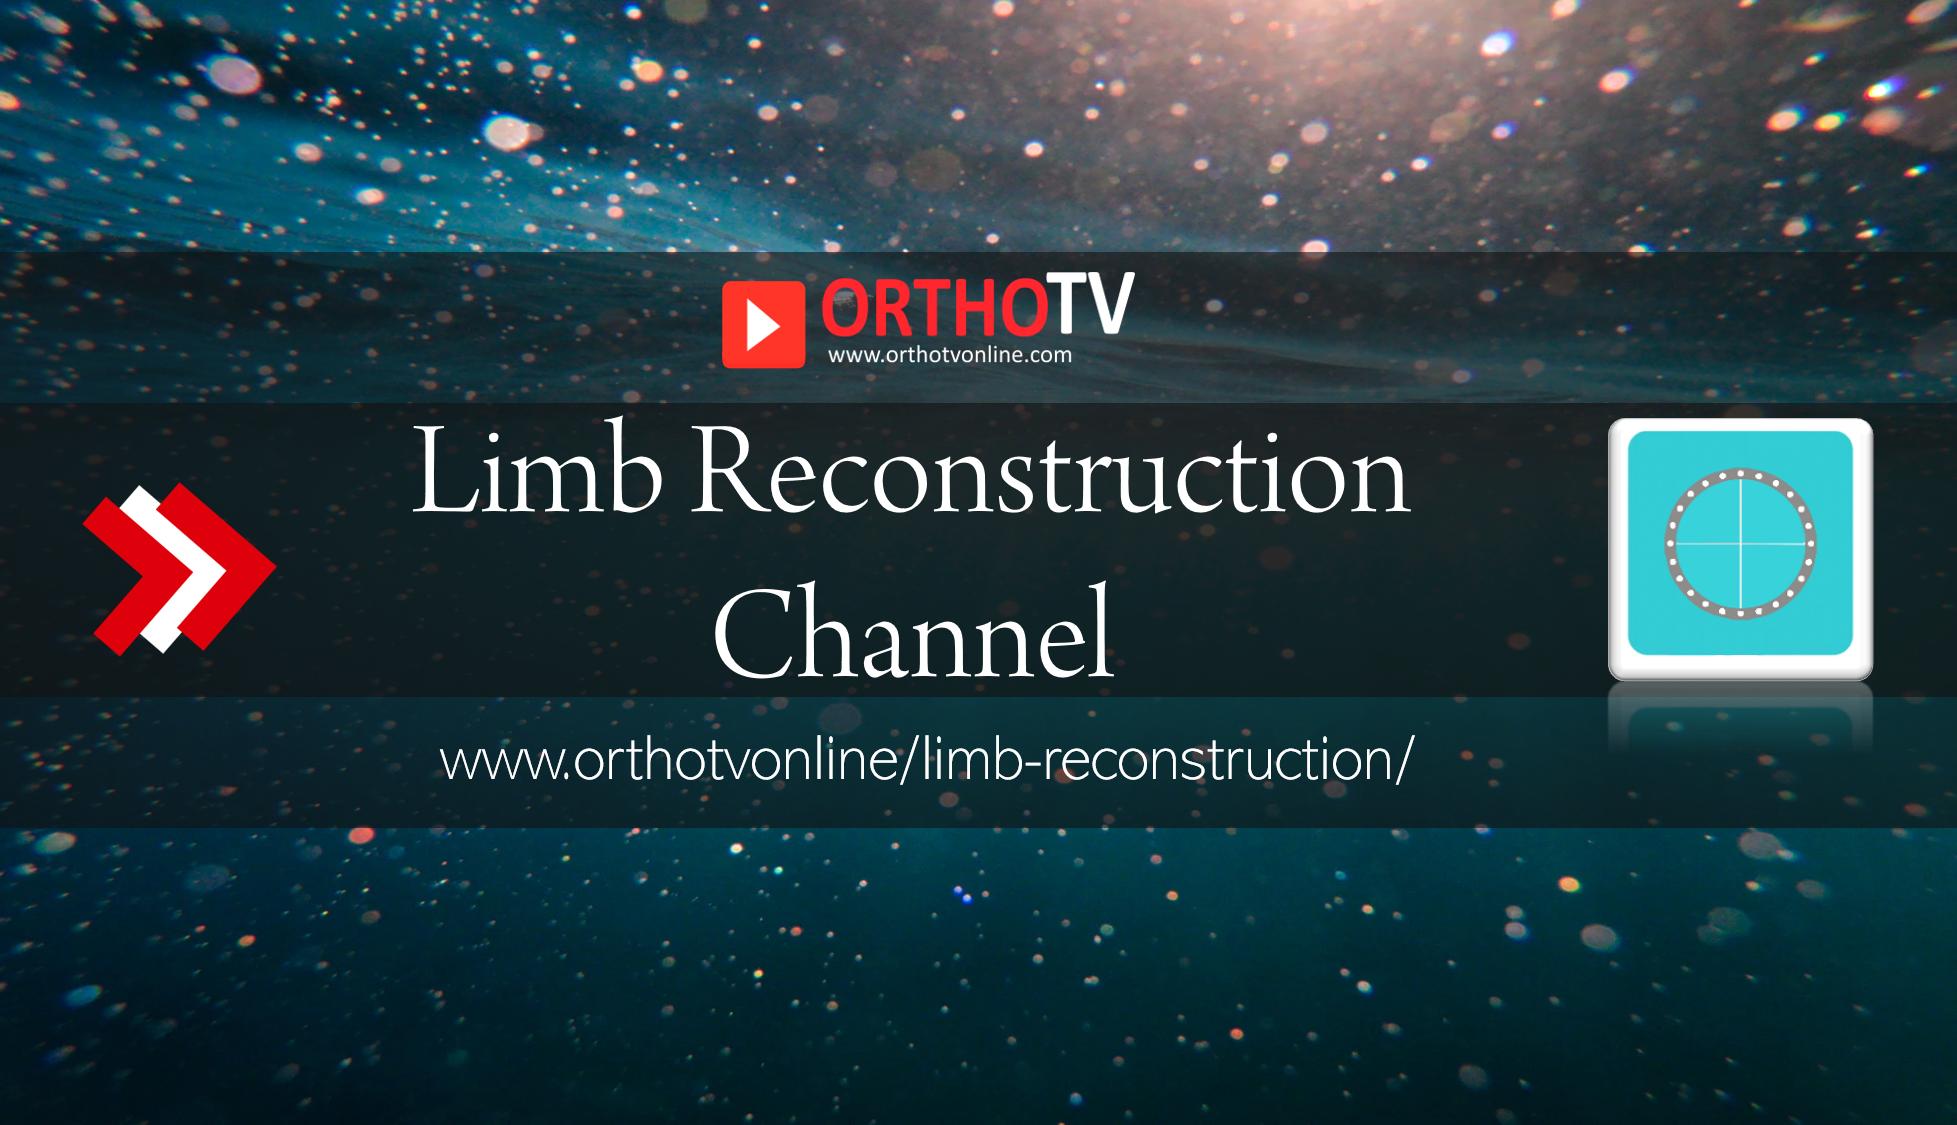 - OrthoTV Limb Reconstruction Channel - Limb Reconstruction